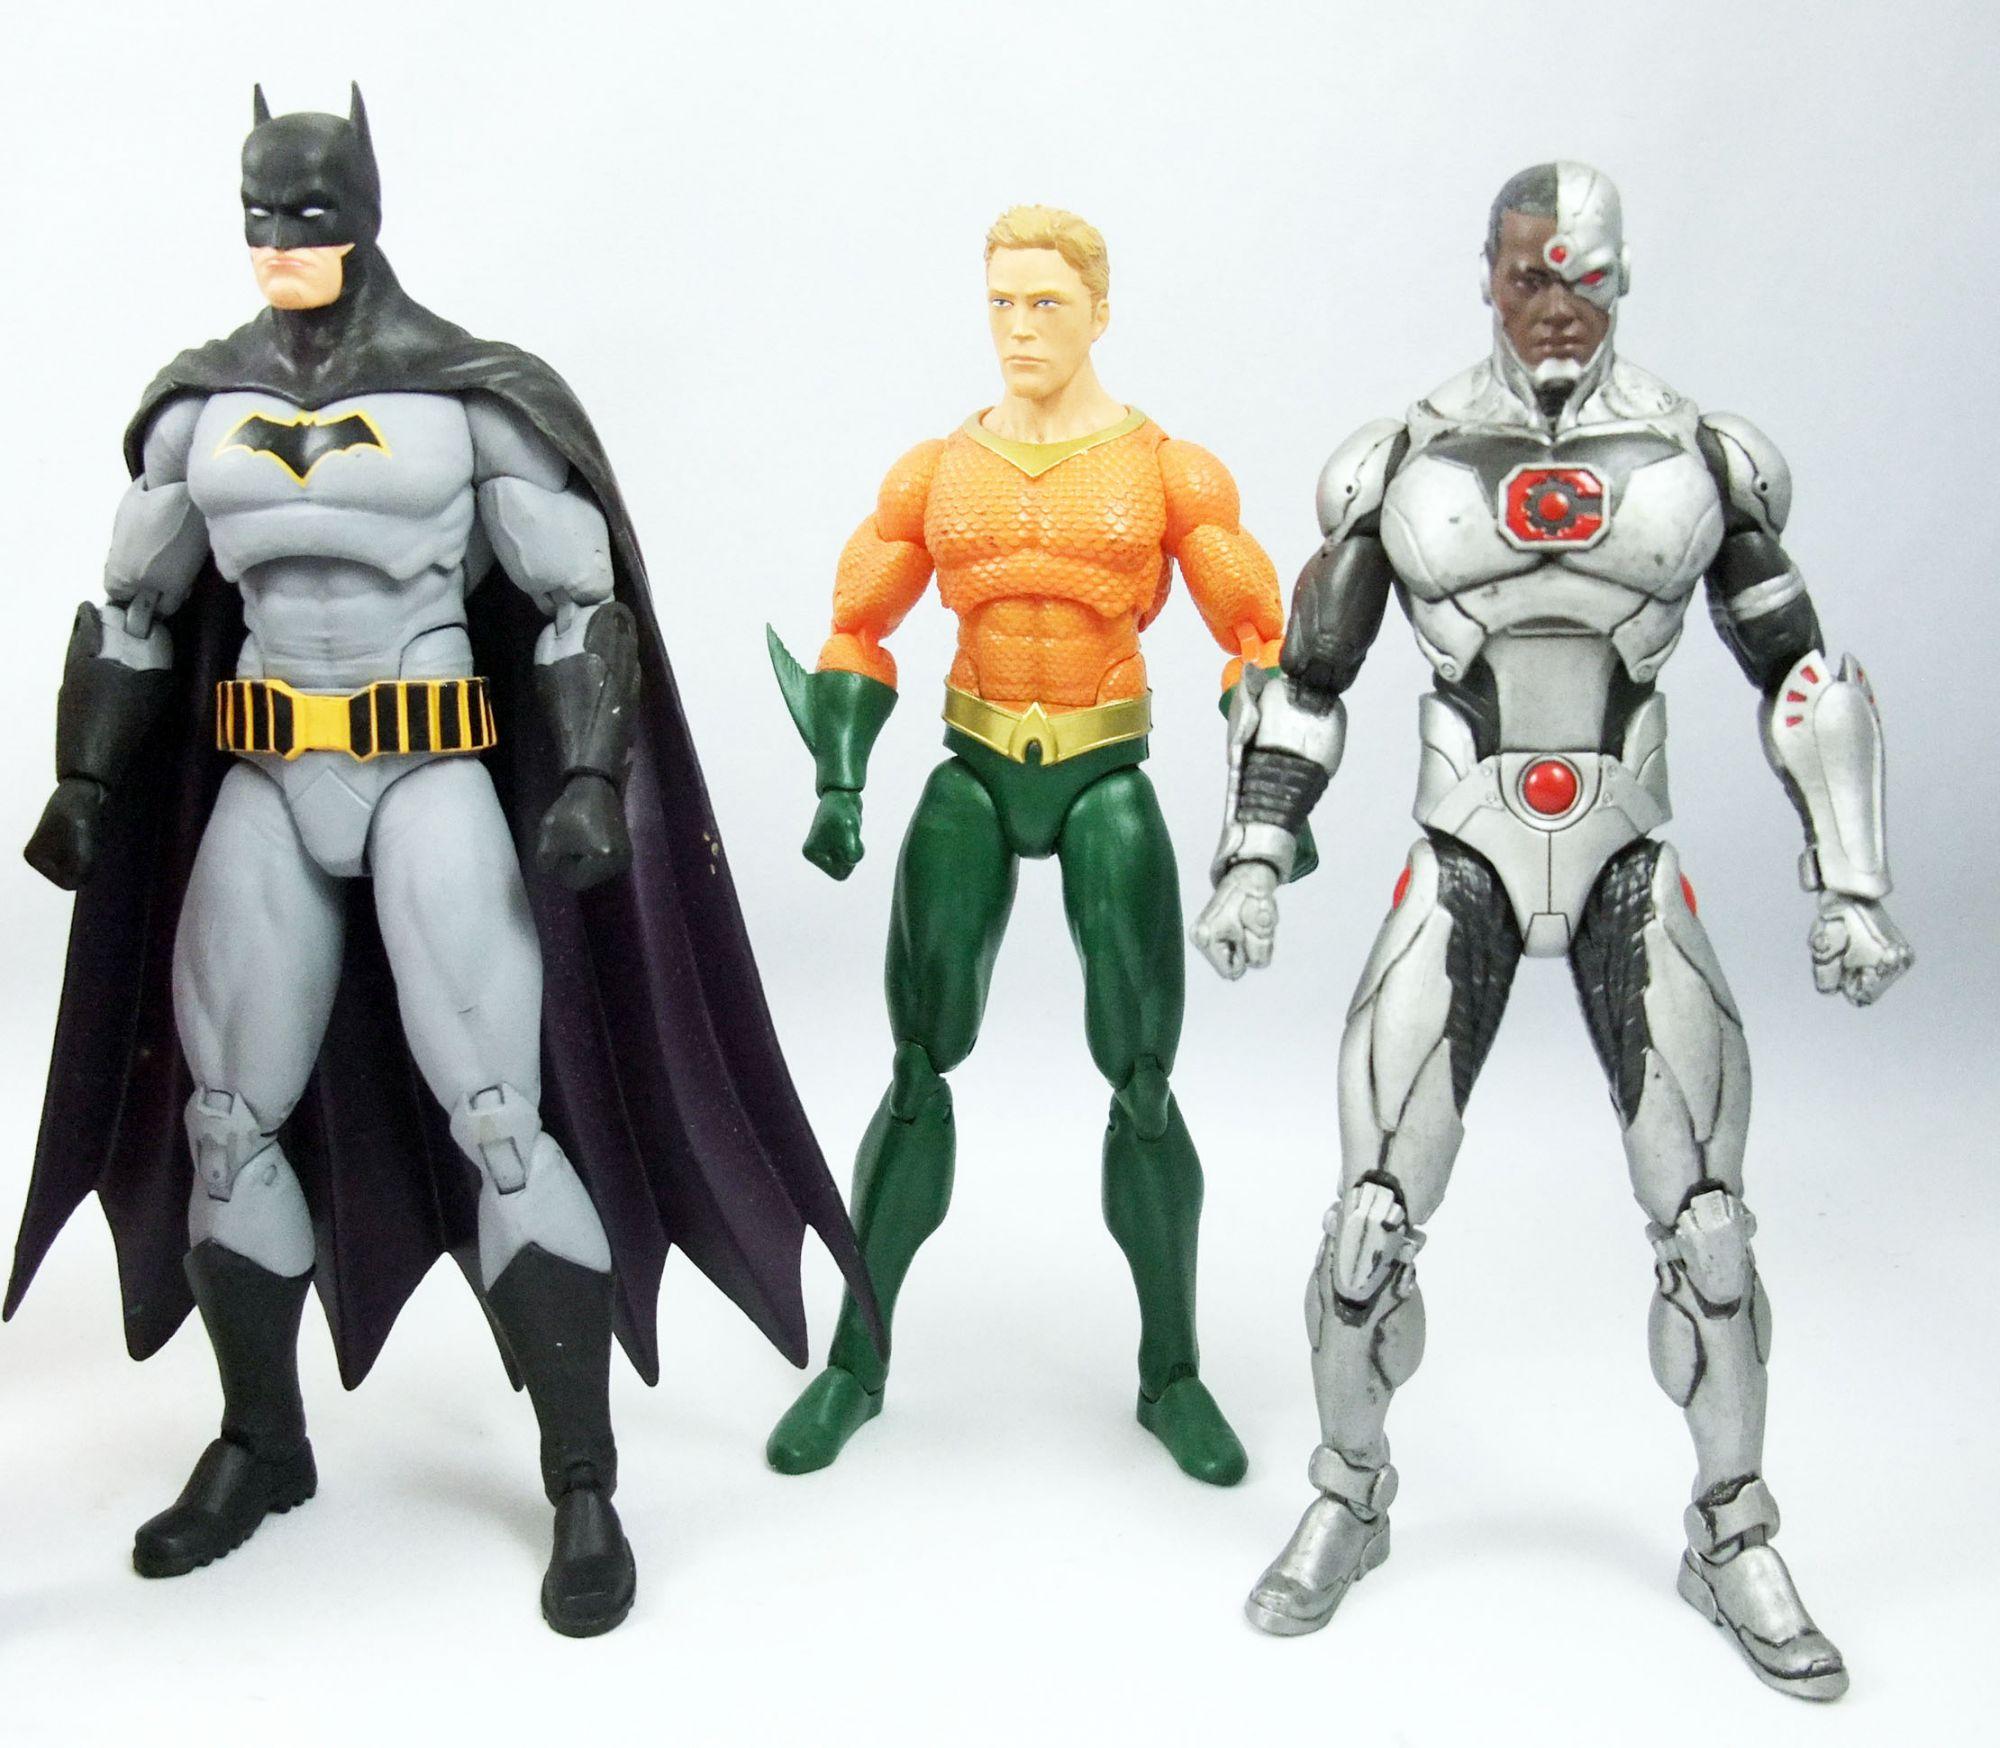 DC Comics Icons - Justice League (loose) : Superman, Batman, Wonder Woman, Flash, Aquaman, Cyborg, Green Lantern